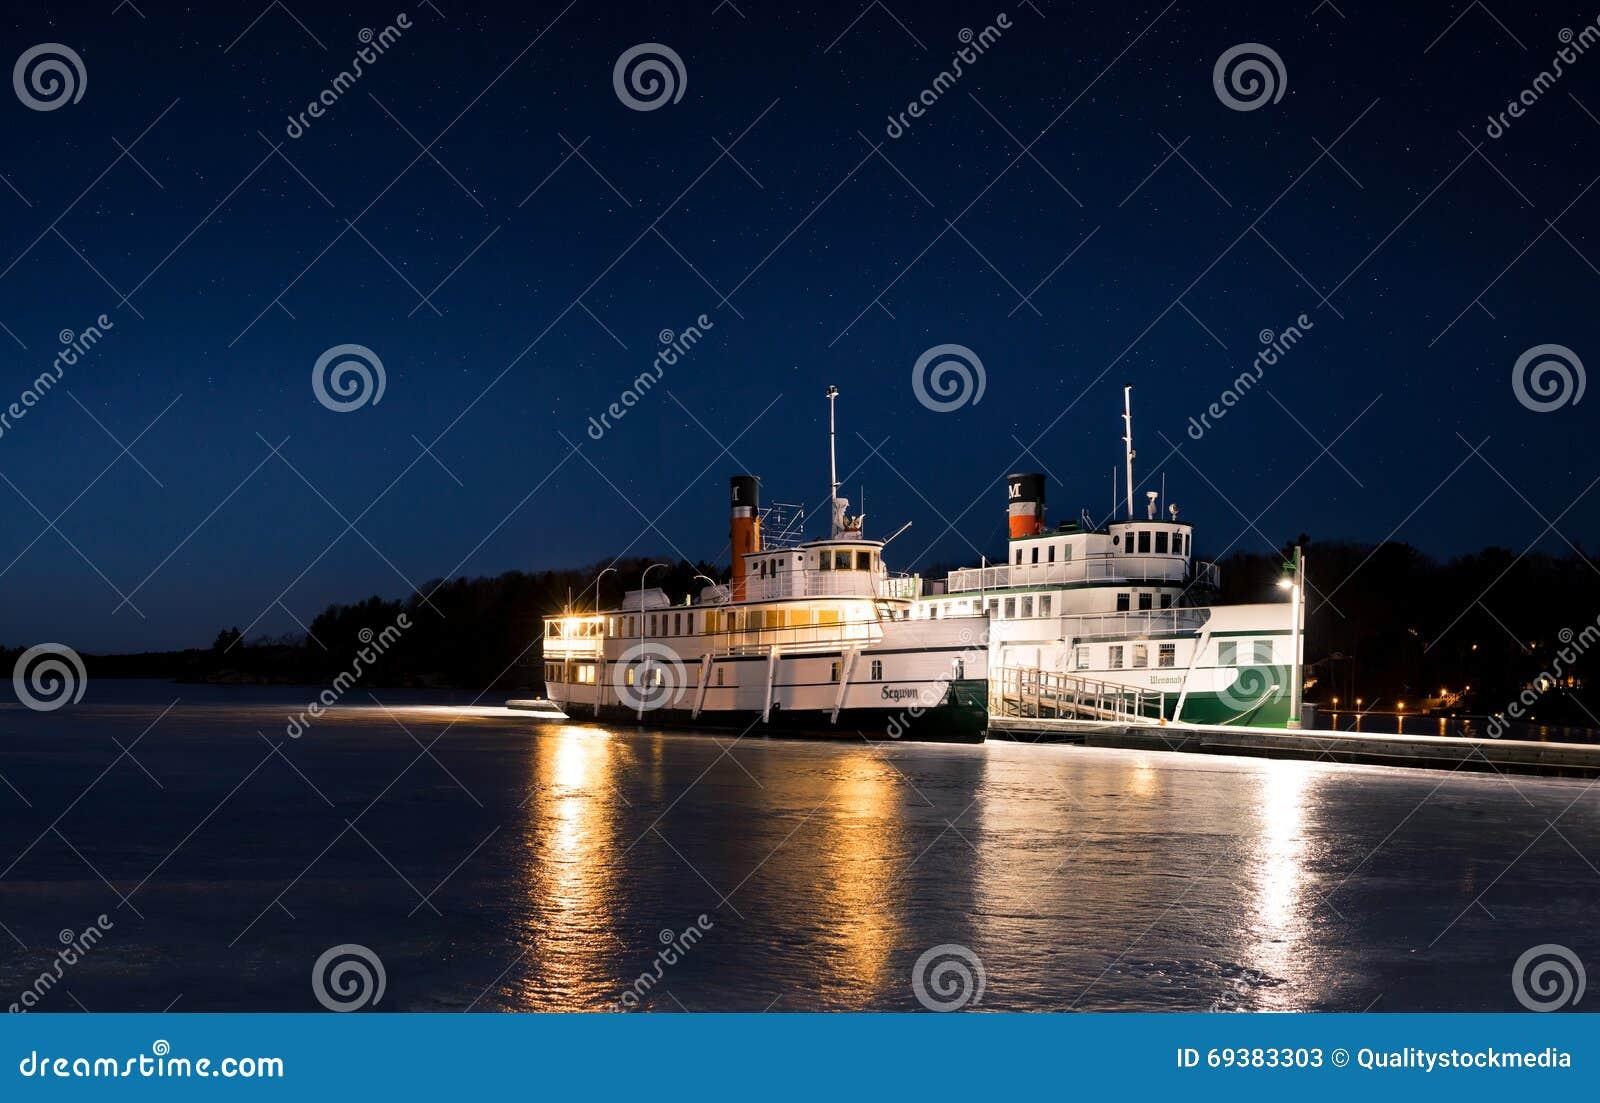 Kontrpara statki